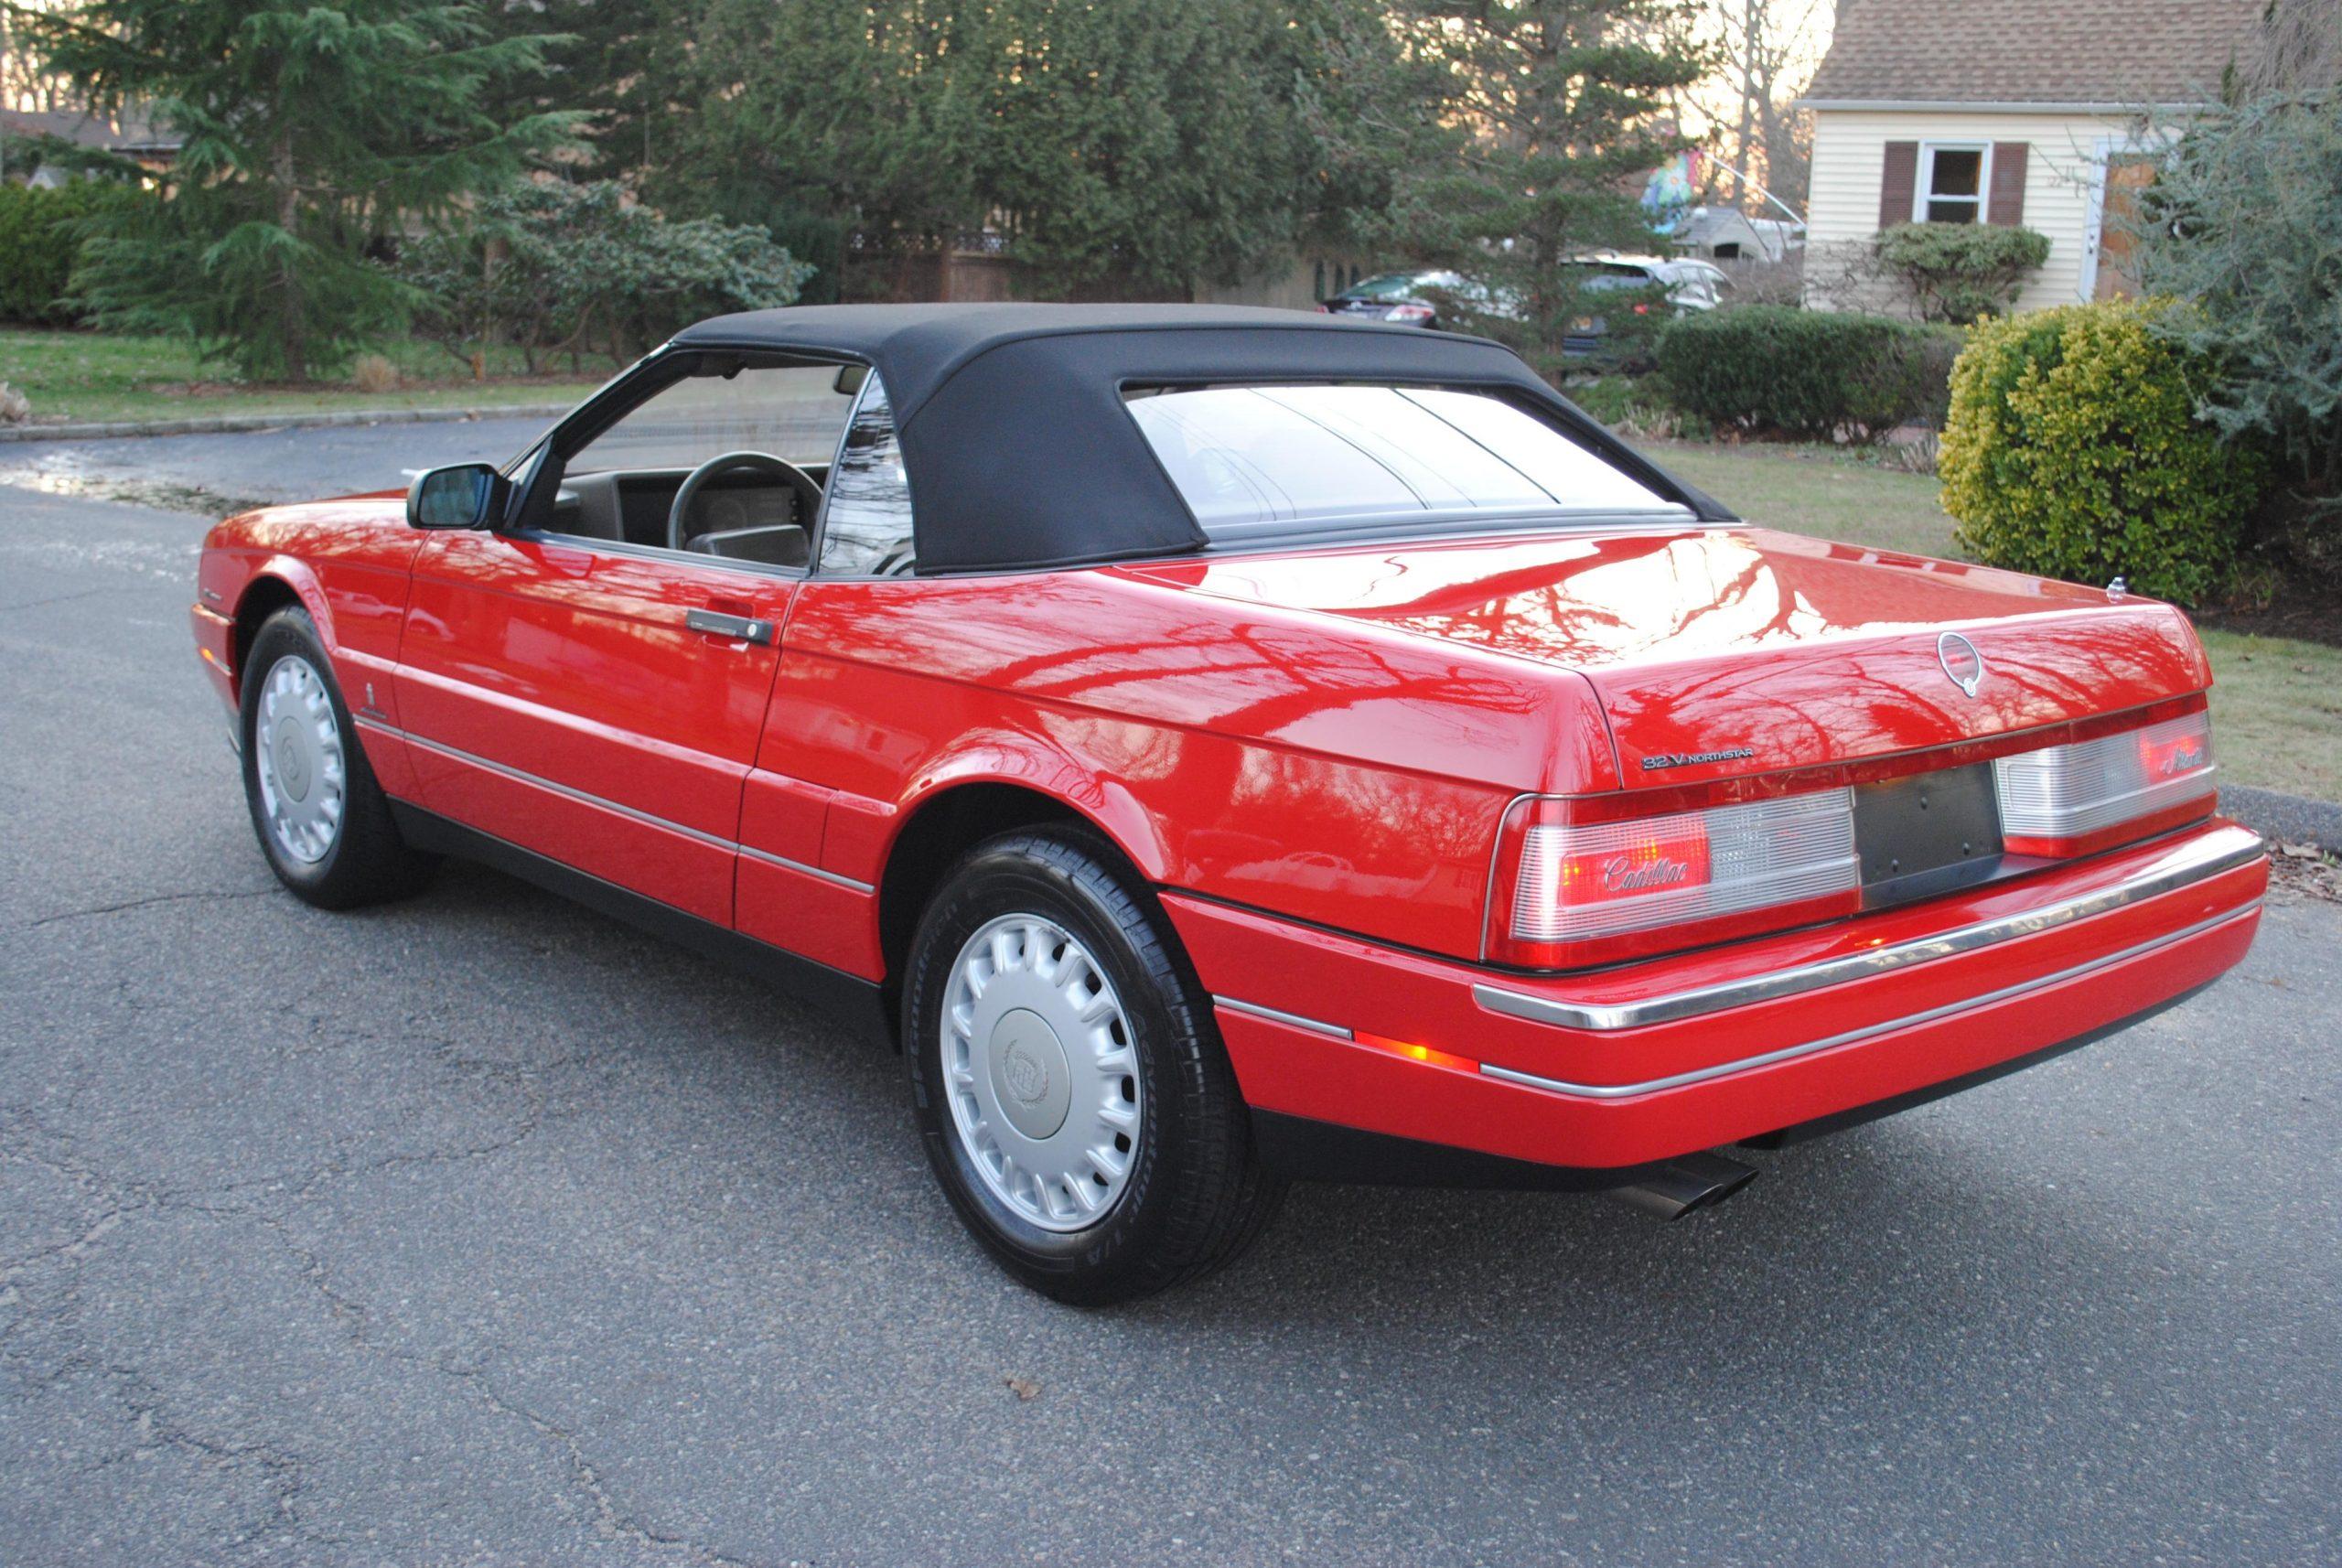 1993 Cadillac Allante rear three-quarter